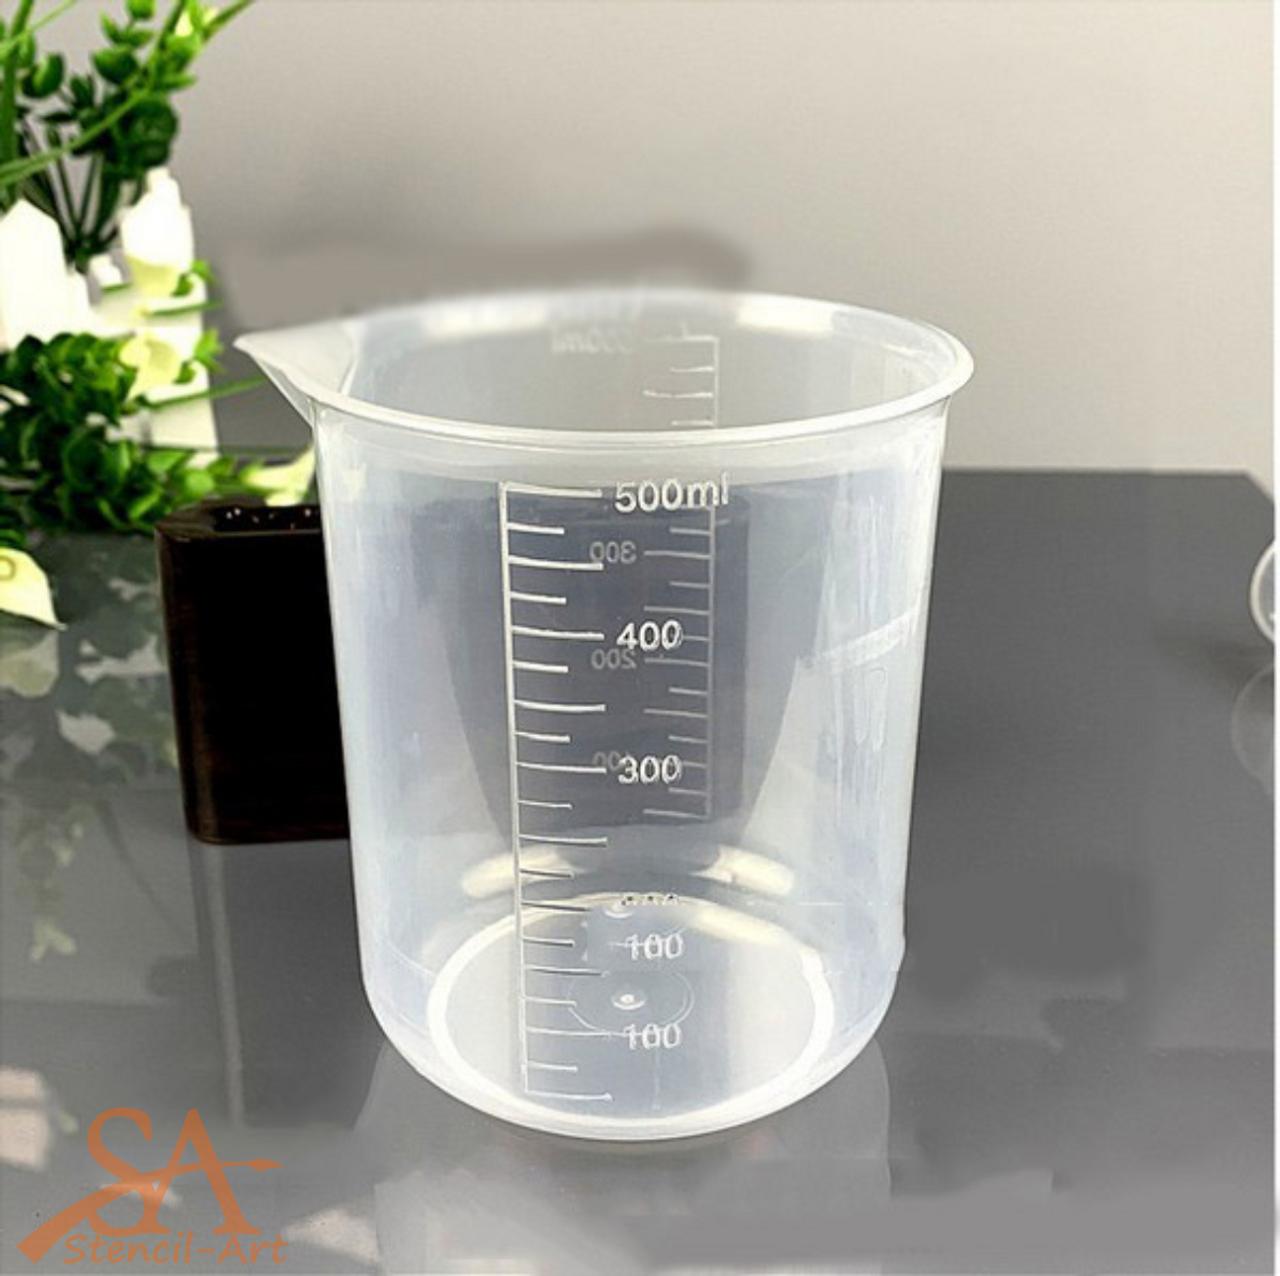 Measuring Cups Single - 500ml